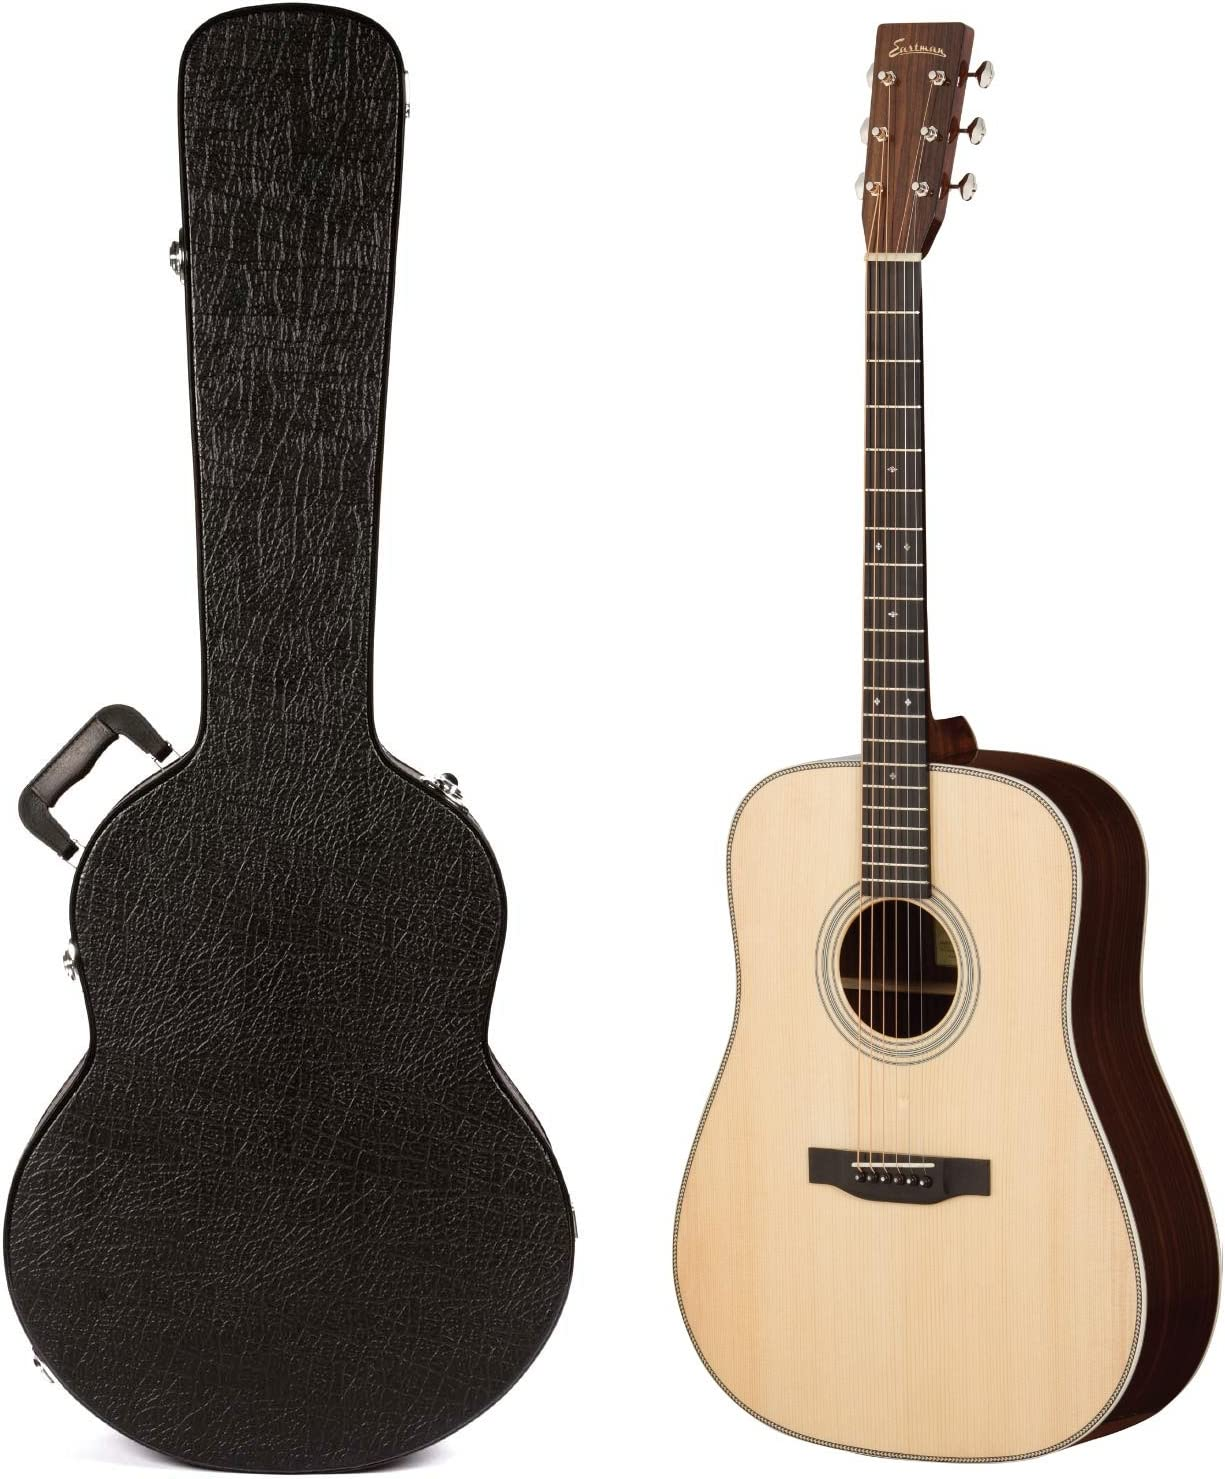 Eastman e20d Dreadnought tradicional plancha de guitarra acústica ...